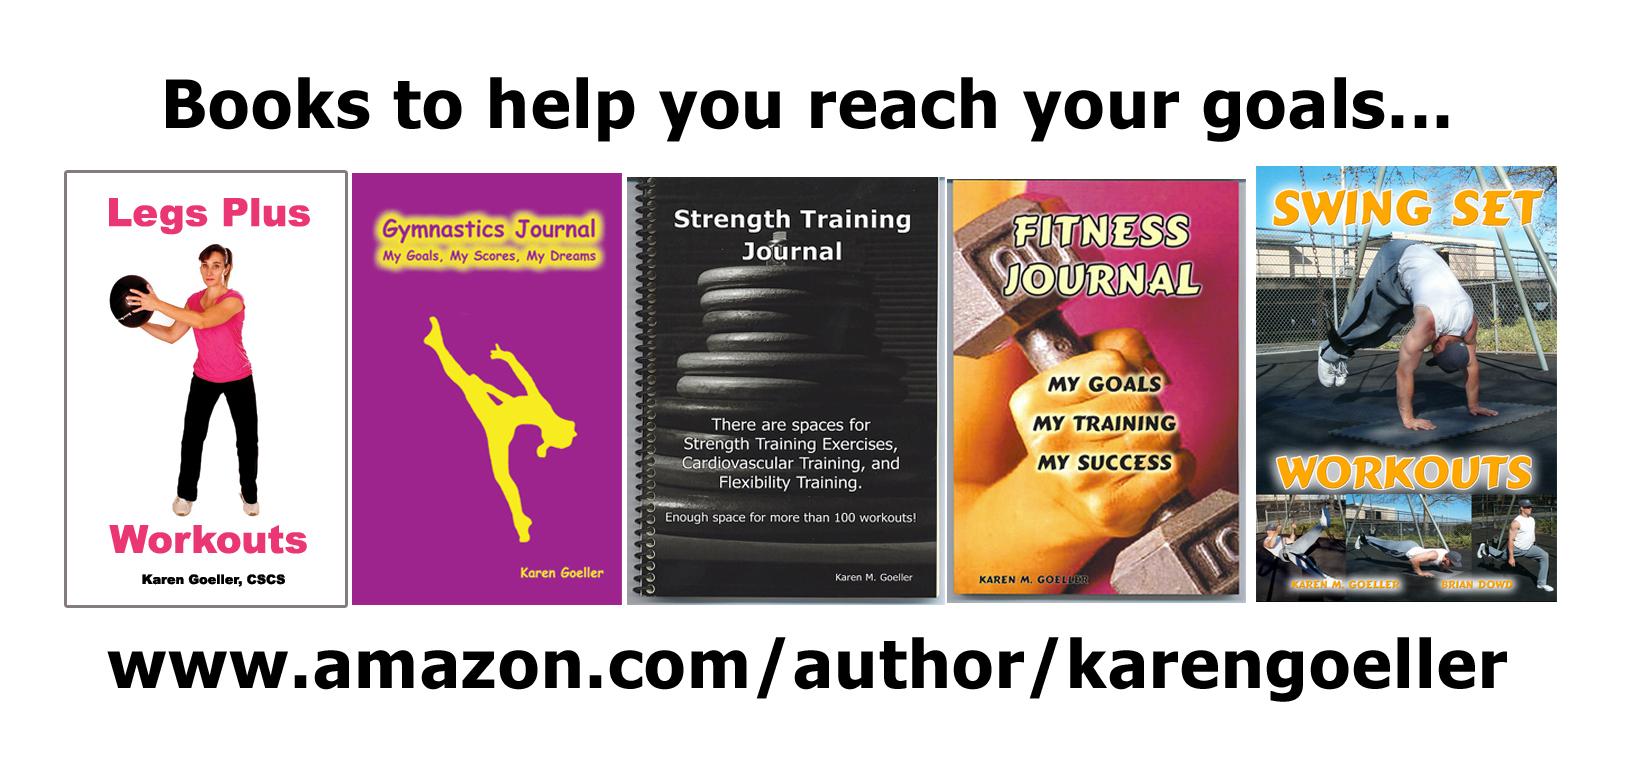 Journals-Fitness